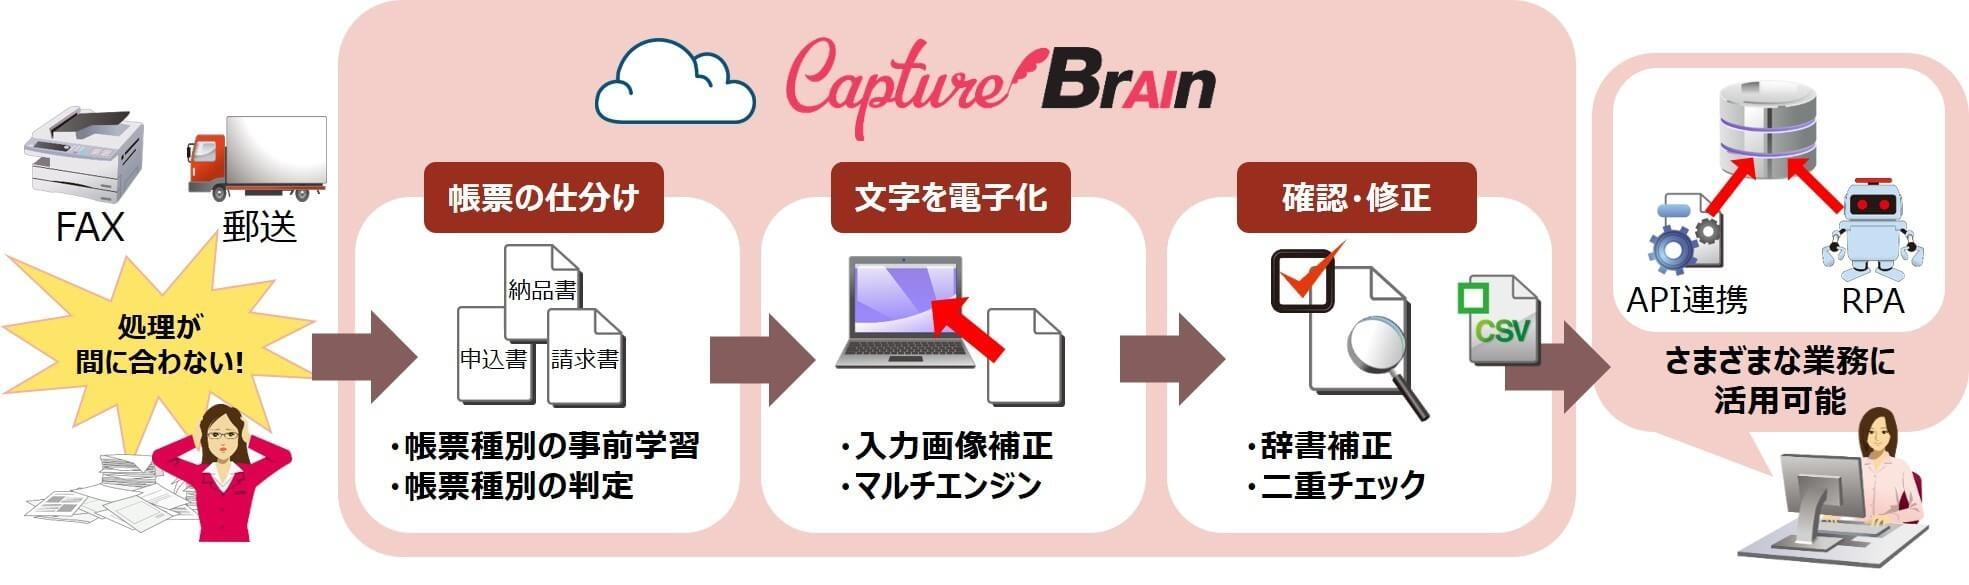 ・AI-OCRの比較9:CaptureBrain(株式会社キヤノンITソリューションズジャパン)